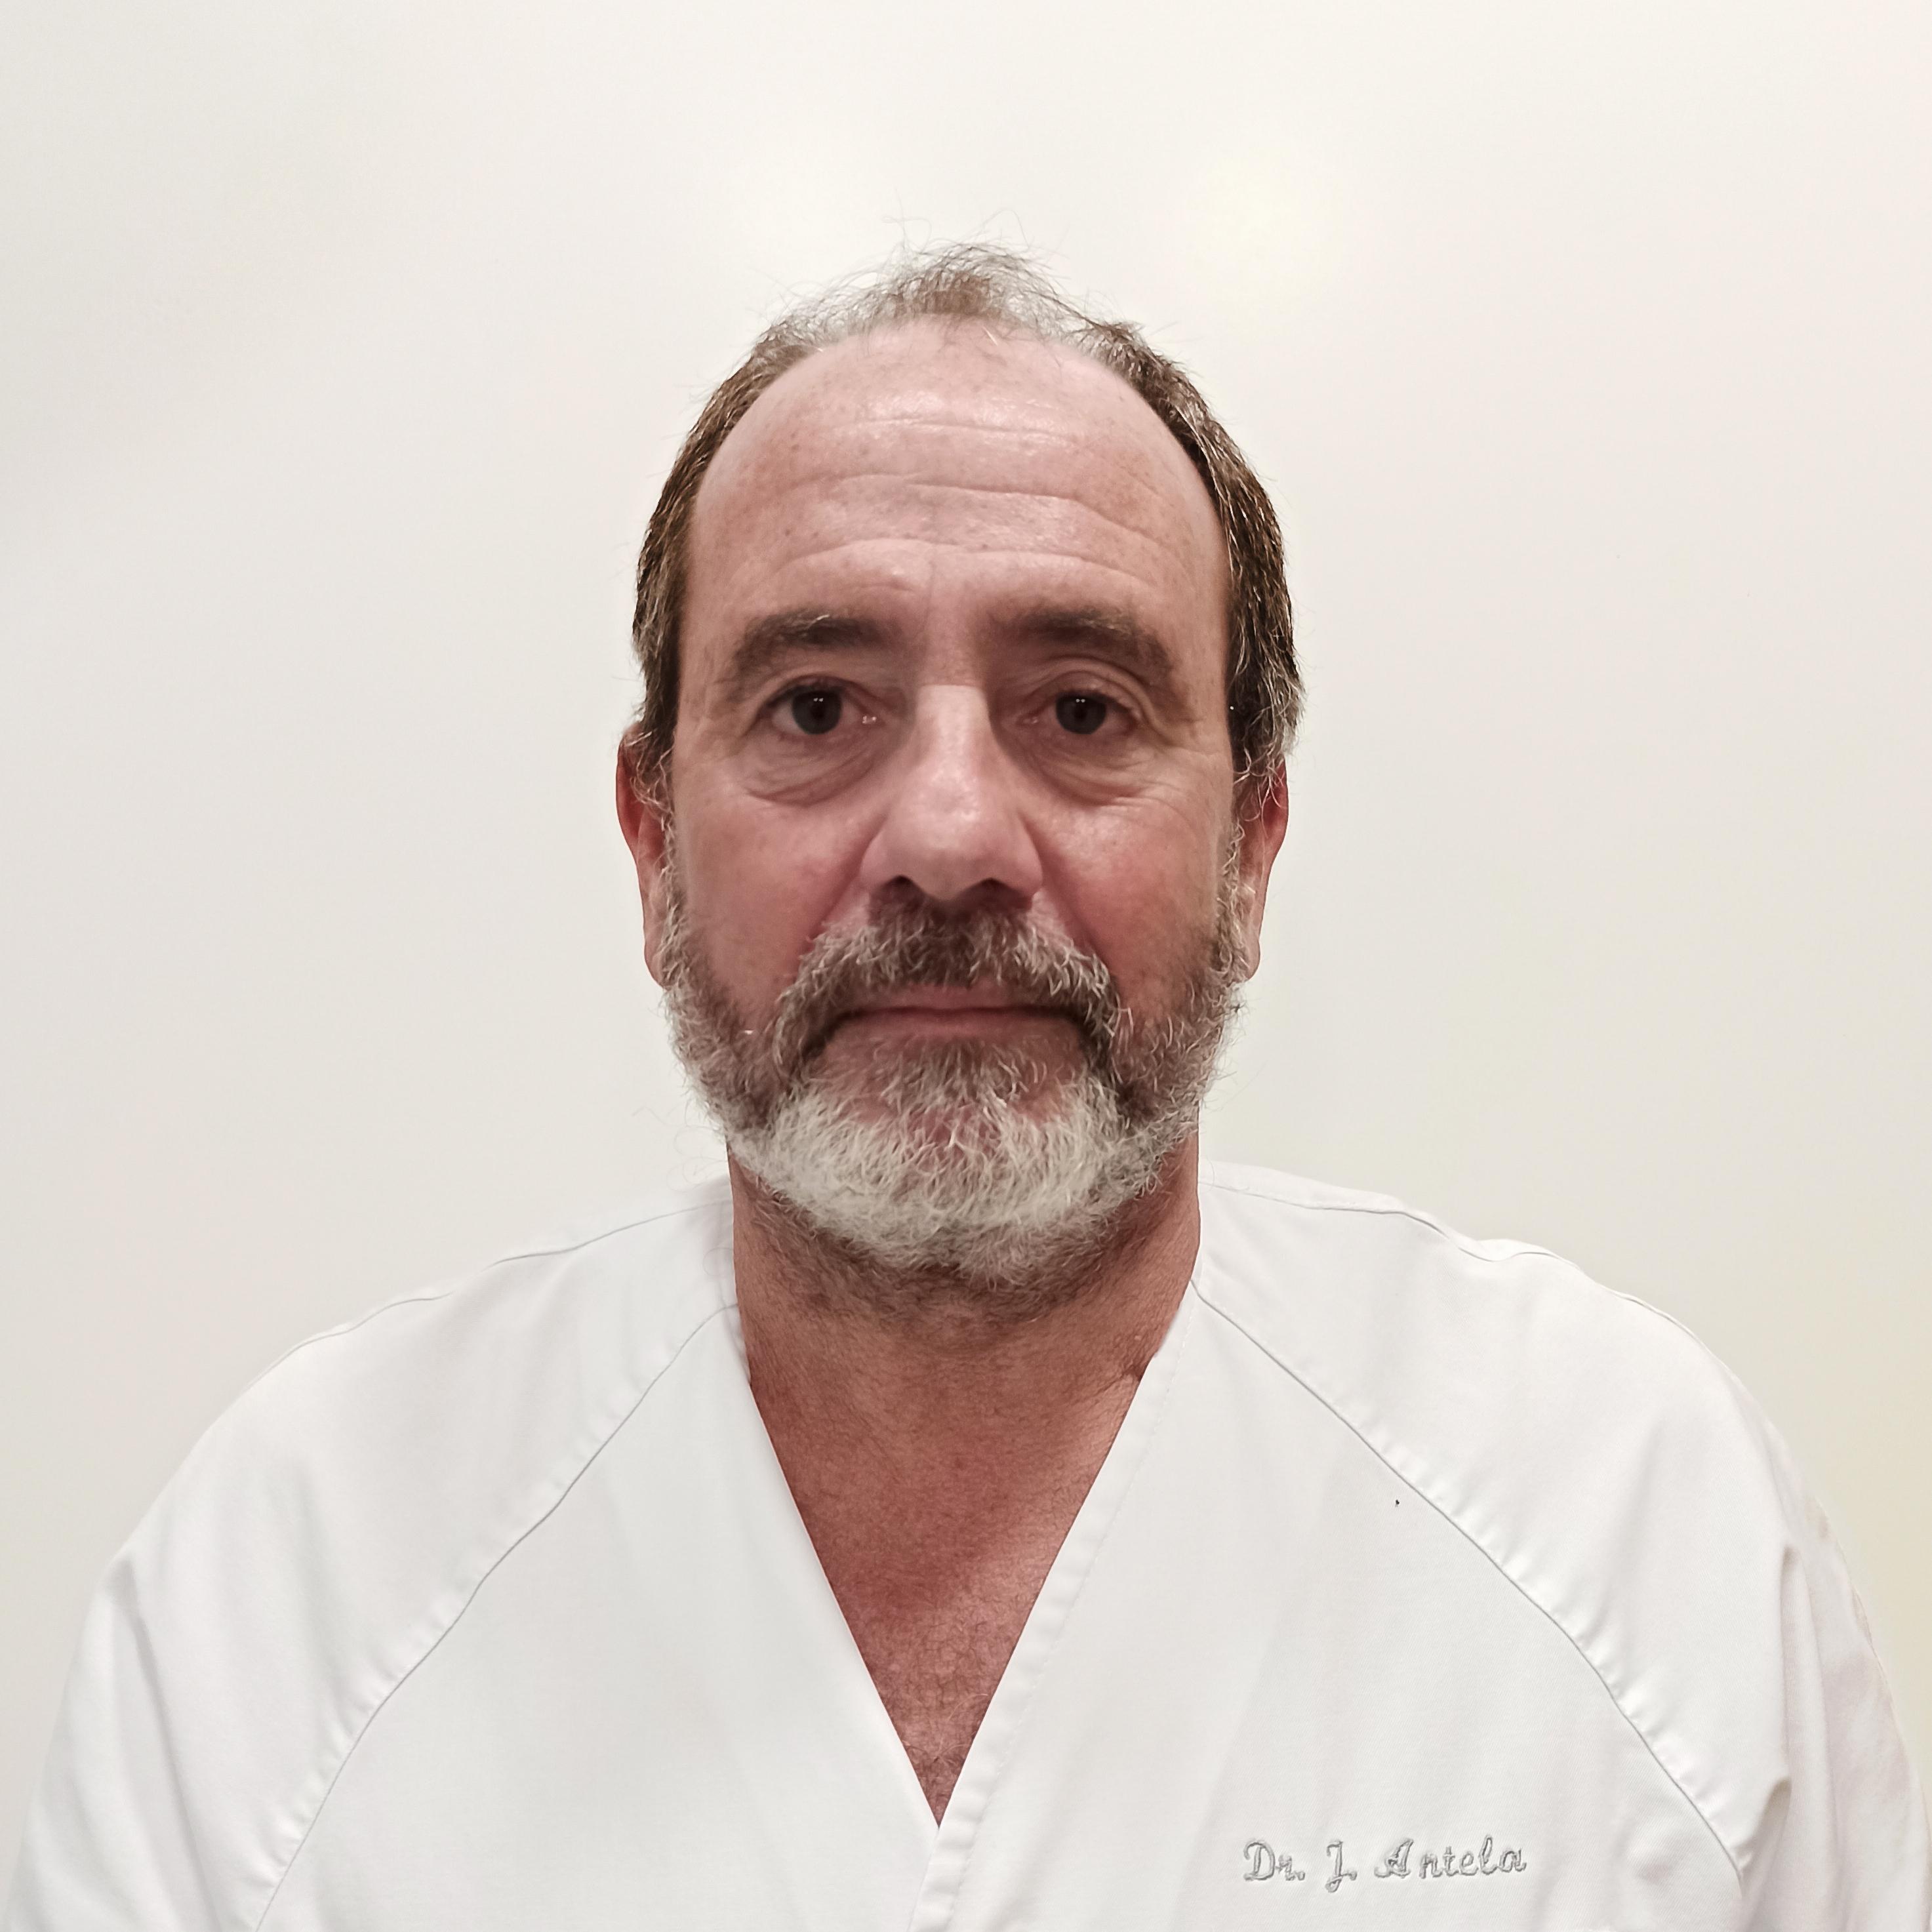 José Carlos Antela López